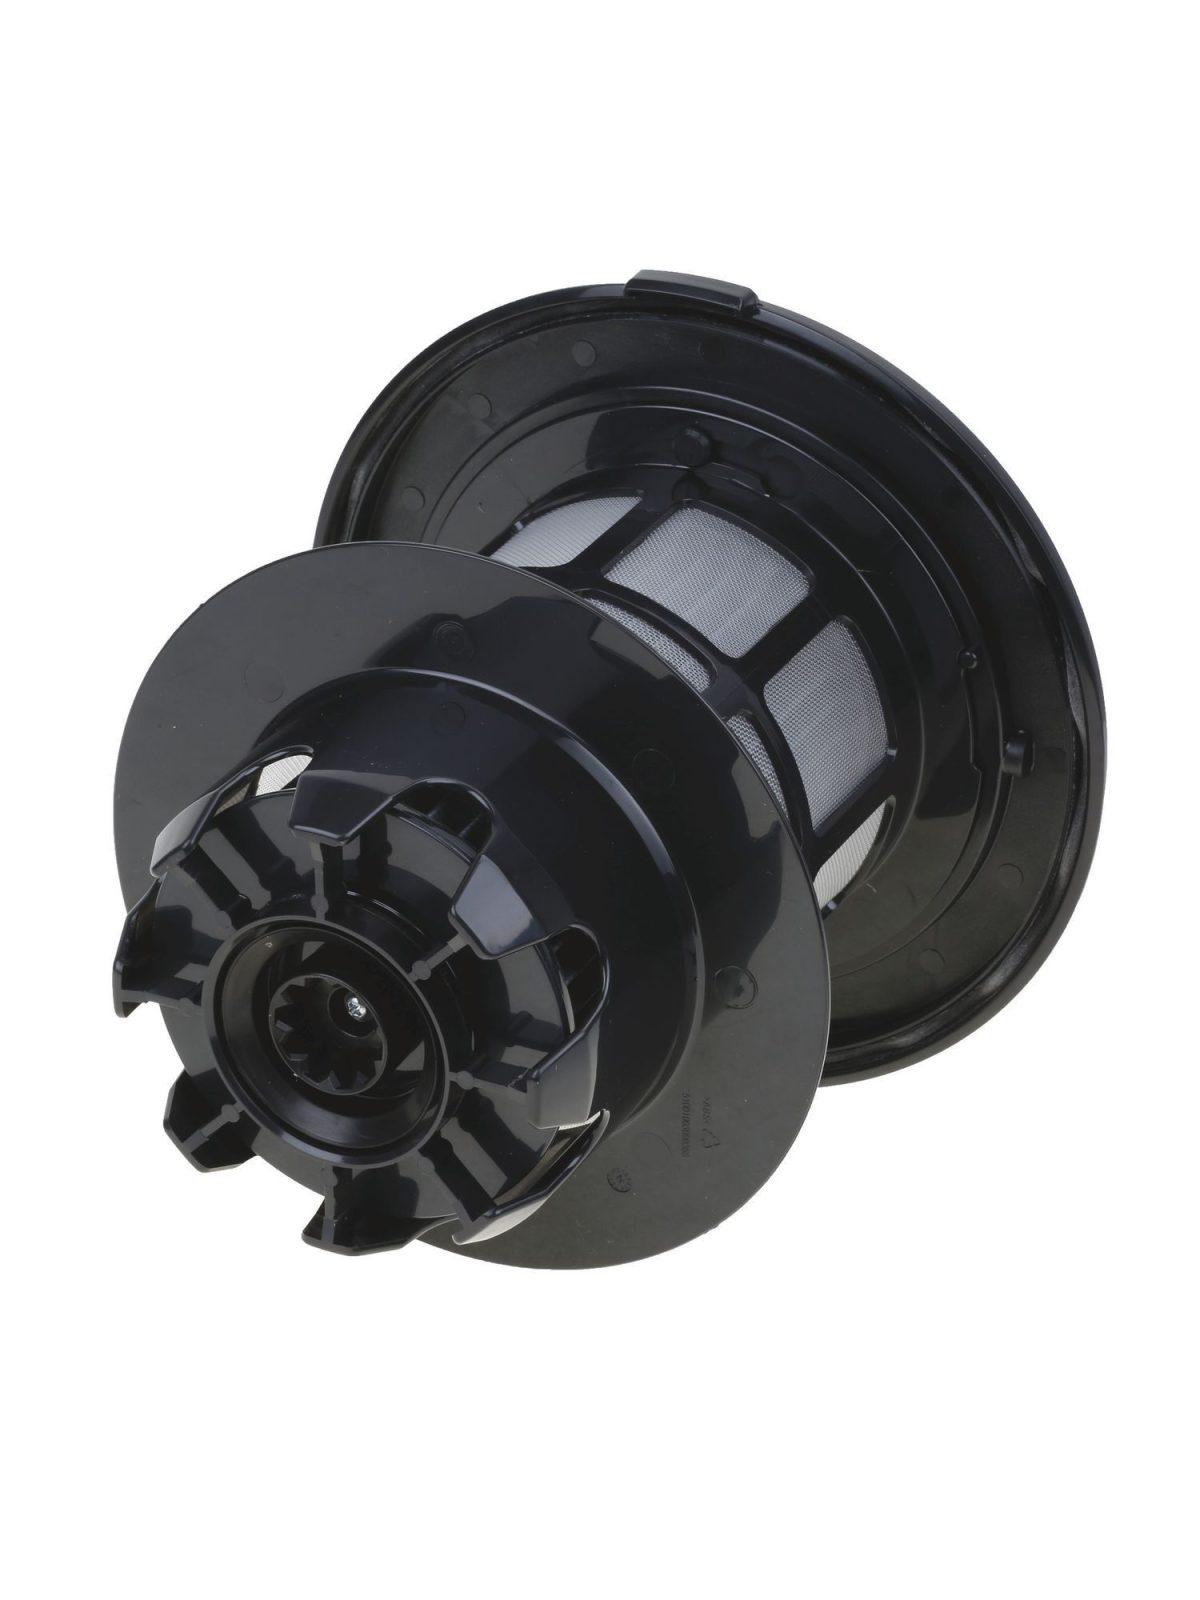 Filtro aspirador Bosch Relaxx BGS5